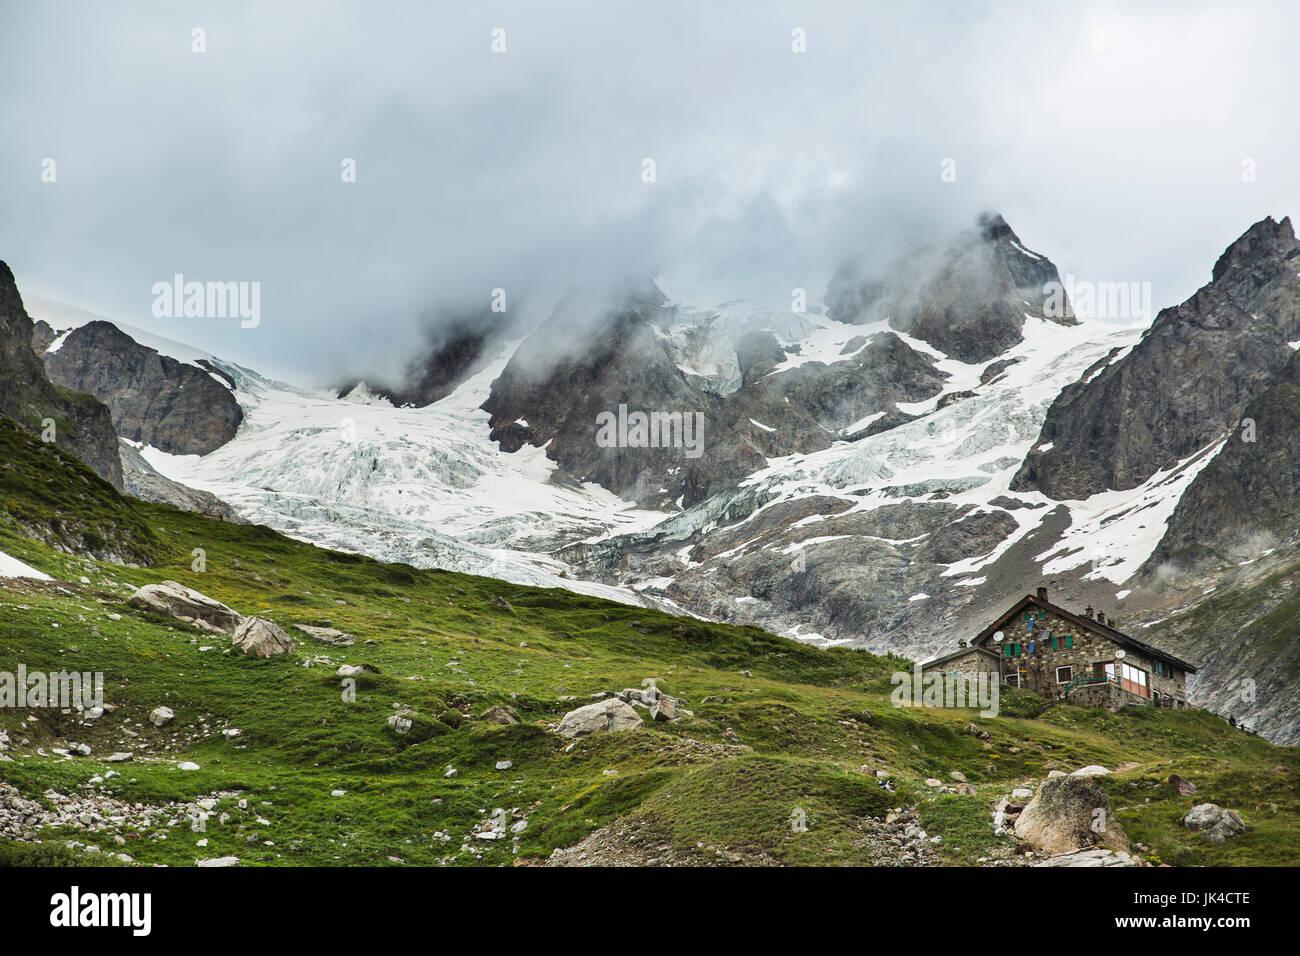 Rifugio Elisabetta in Val Veny in Italy along the Tour Du Mont Blanc - Stock Image